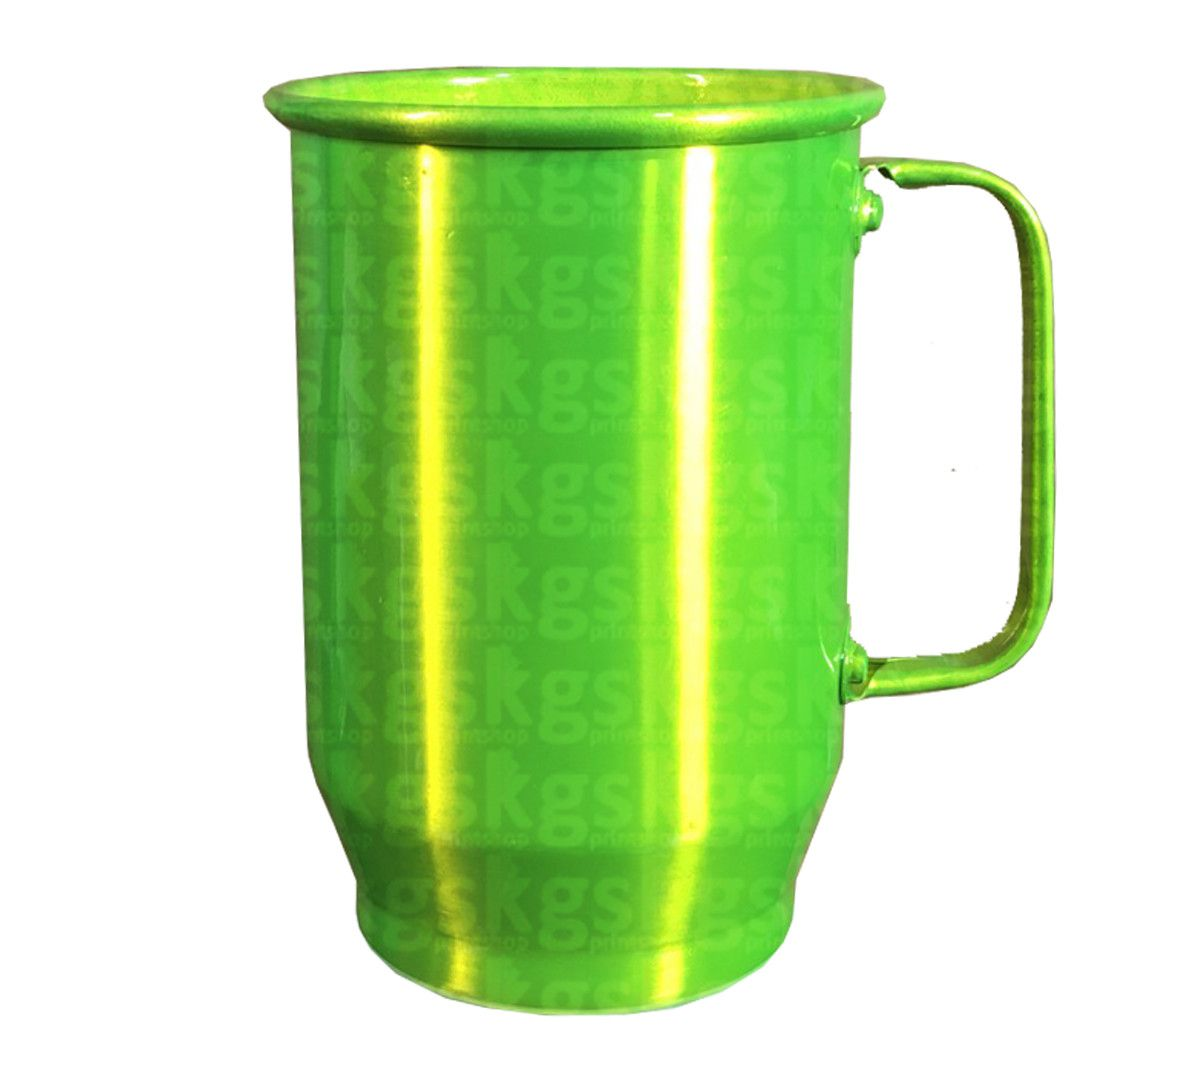 Caneca Alumínio 600ml - Verde Claro